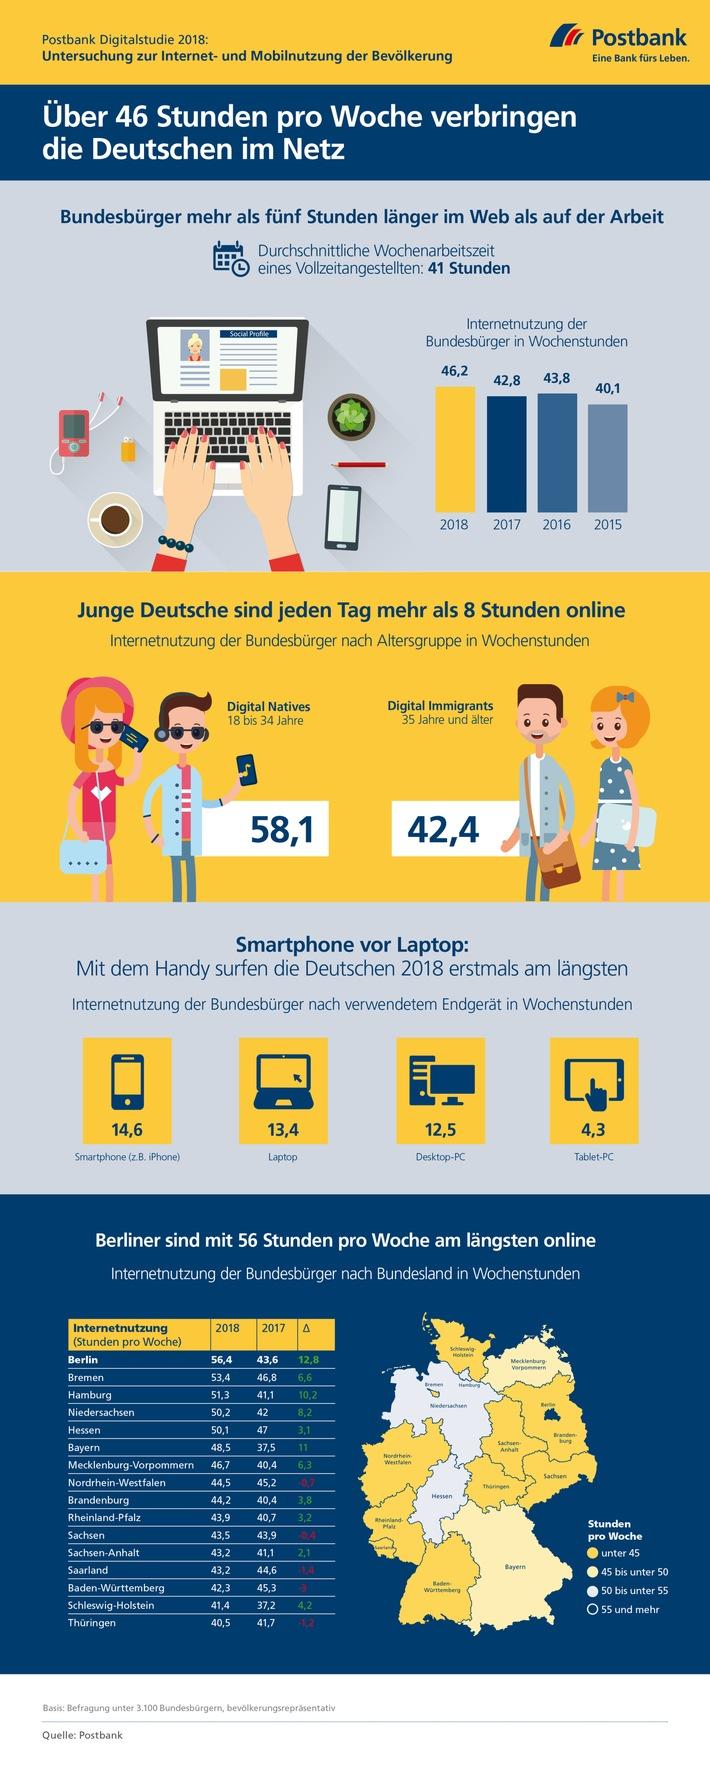 Postbank Digitalstudie 2018